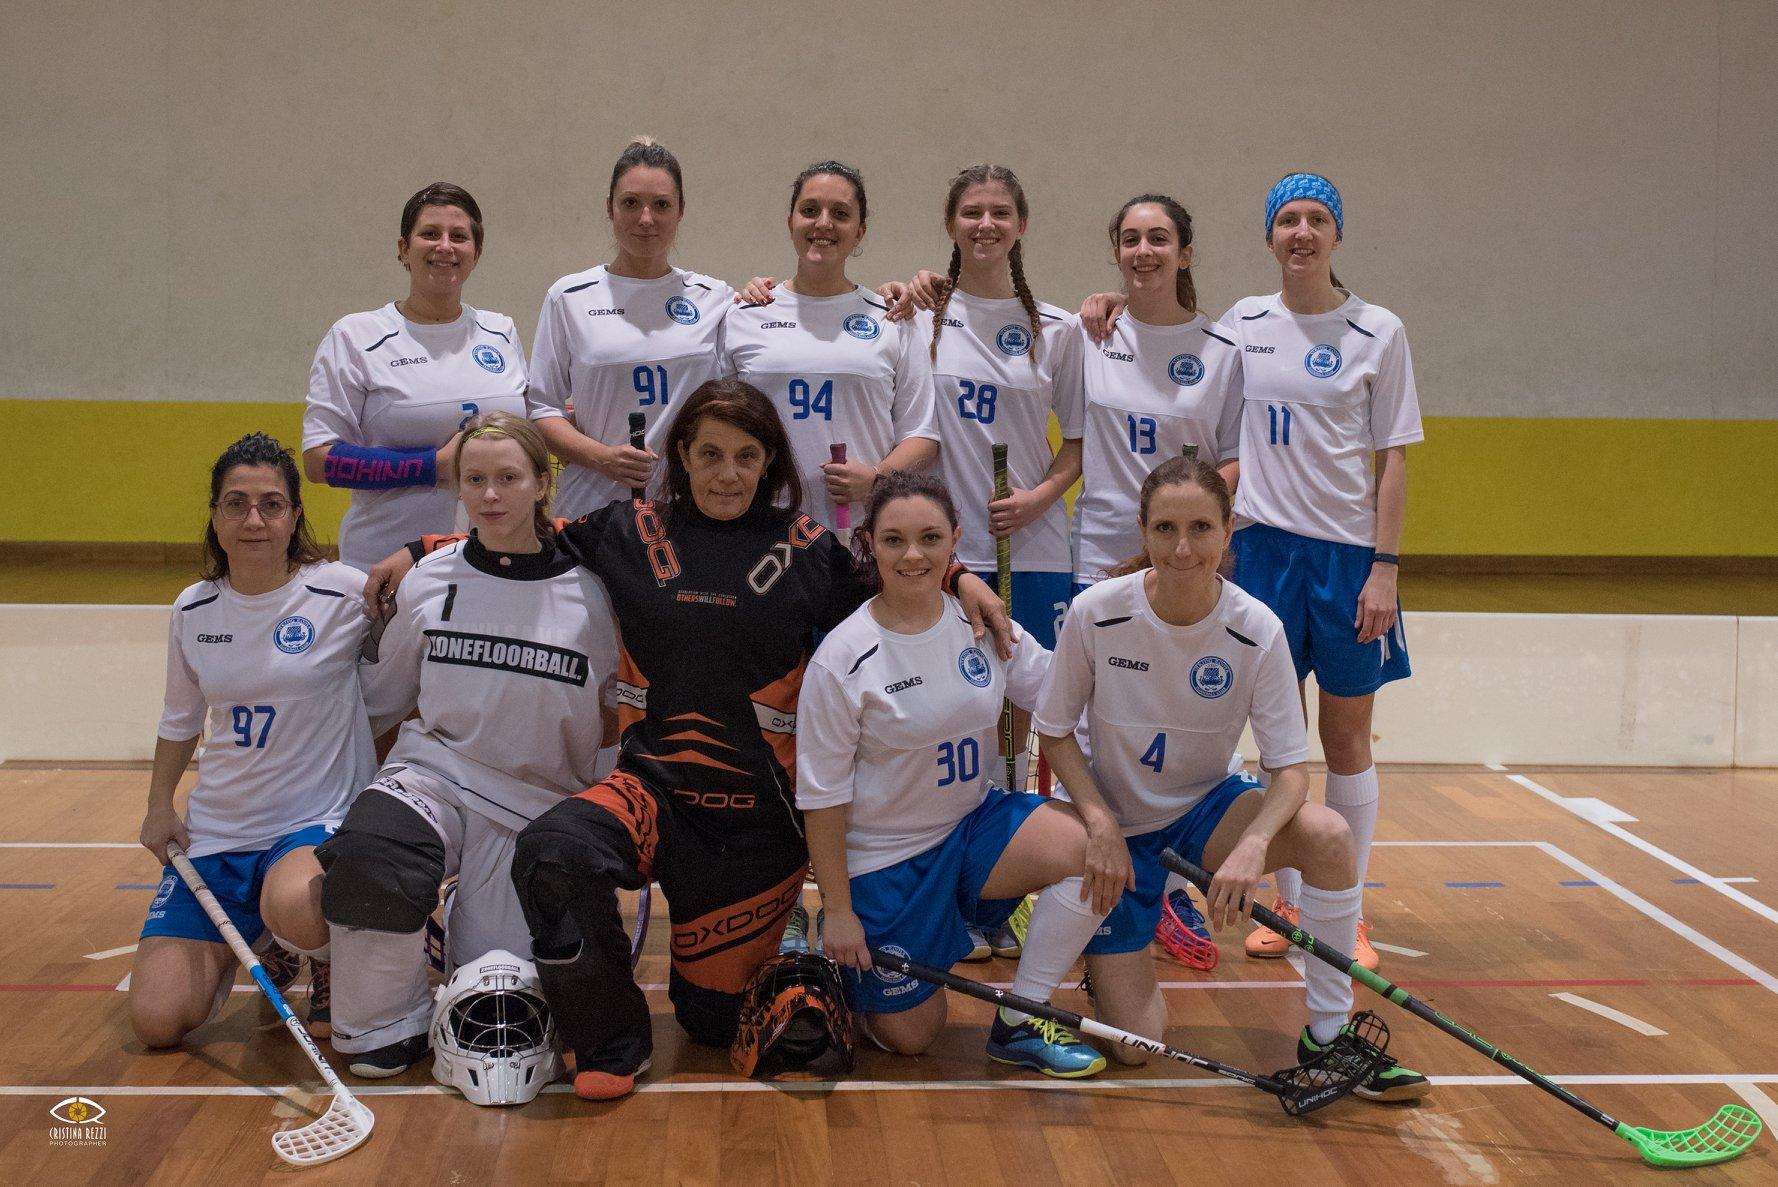 200821 - 02 -Team Femminile